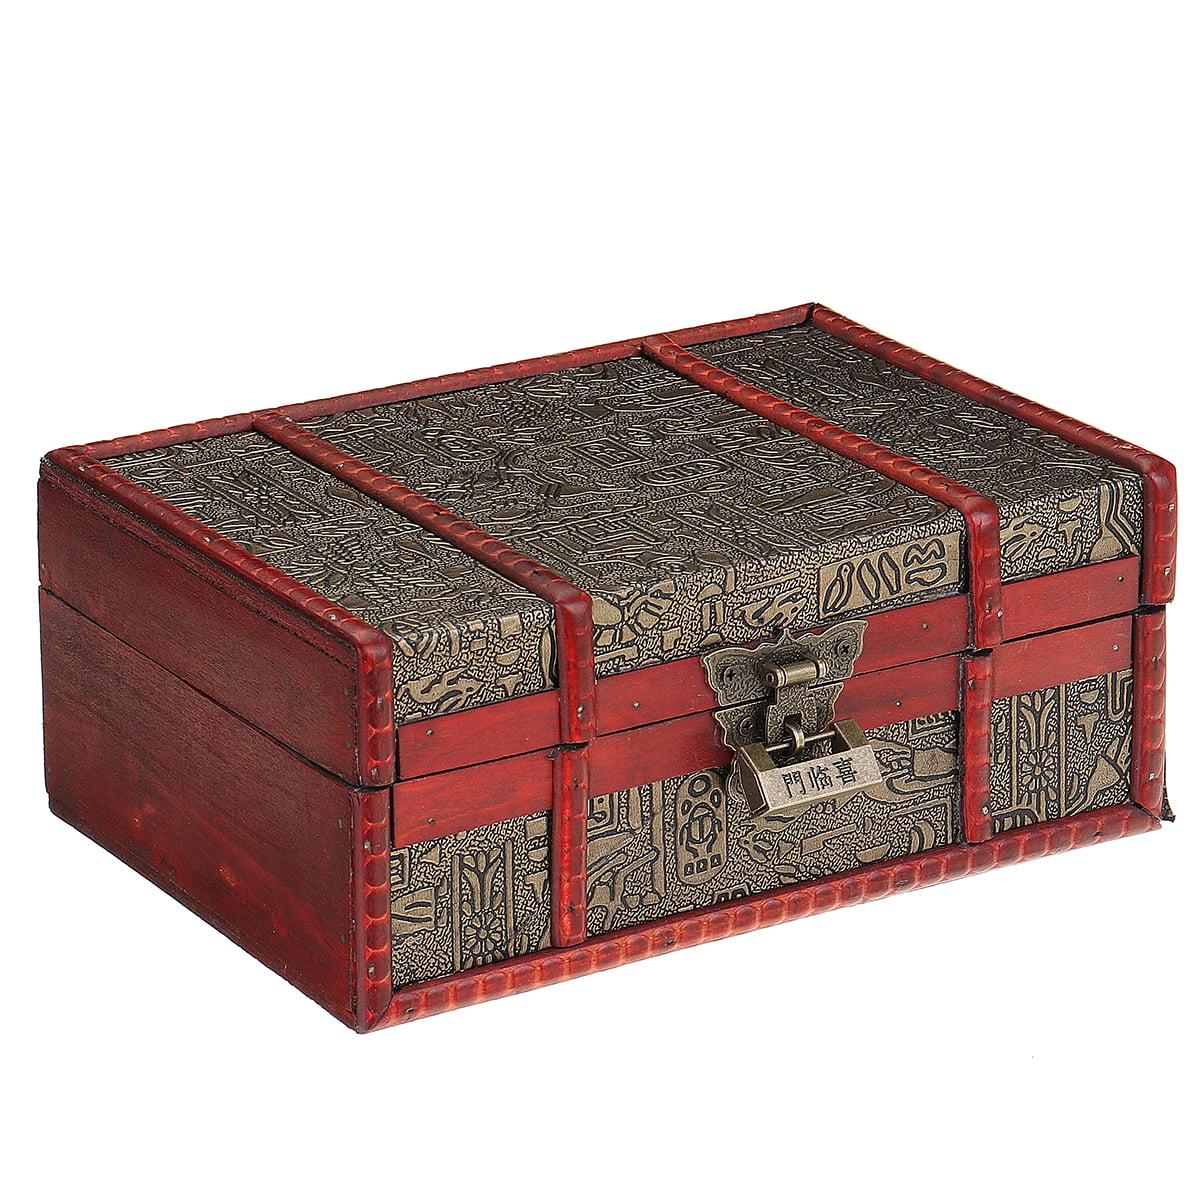 Wooden Retro Pirate Treasure Chest Box Gem Jewelry Trinket Keepsake Storage Case